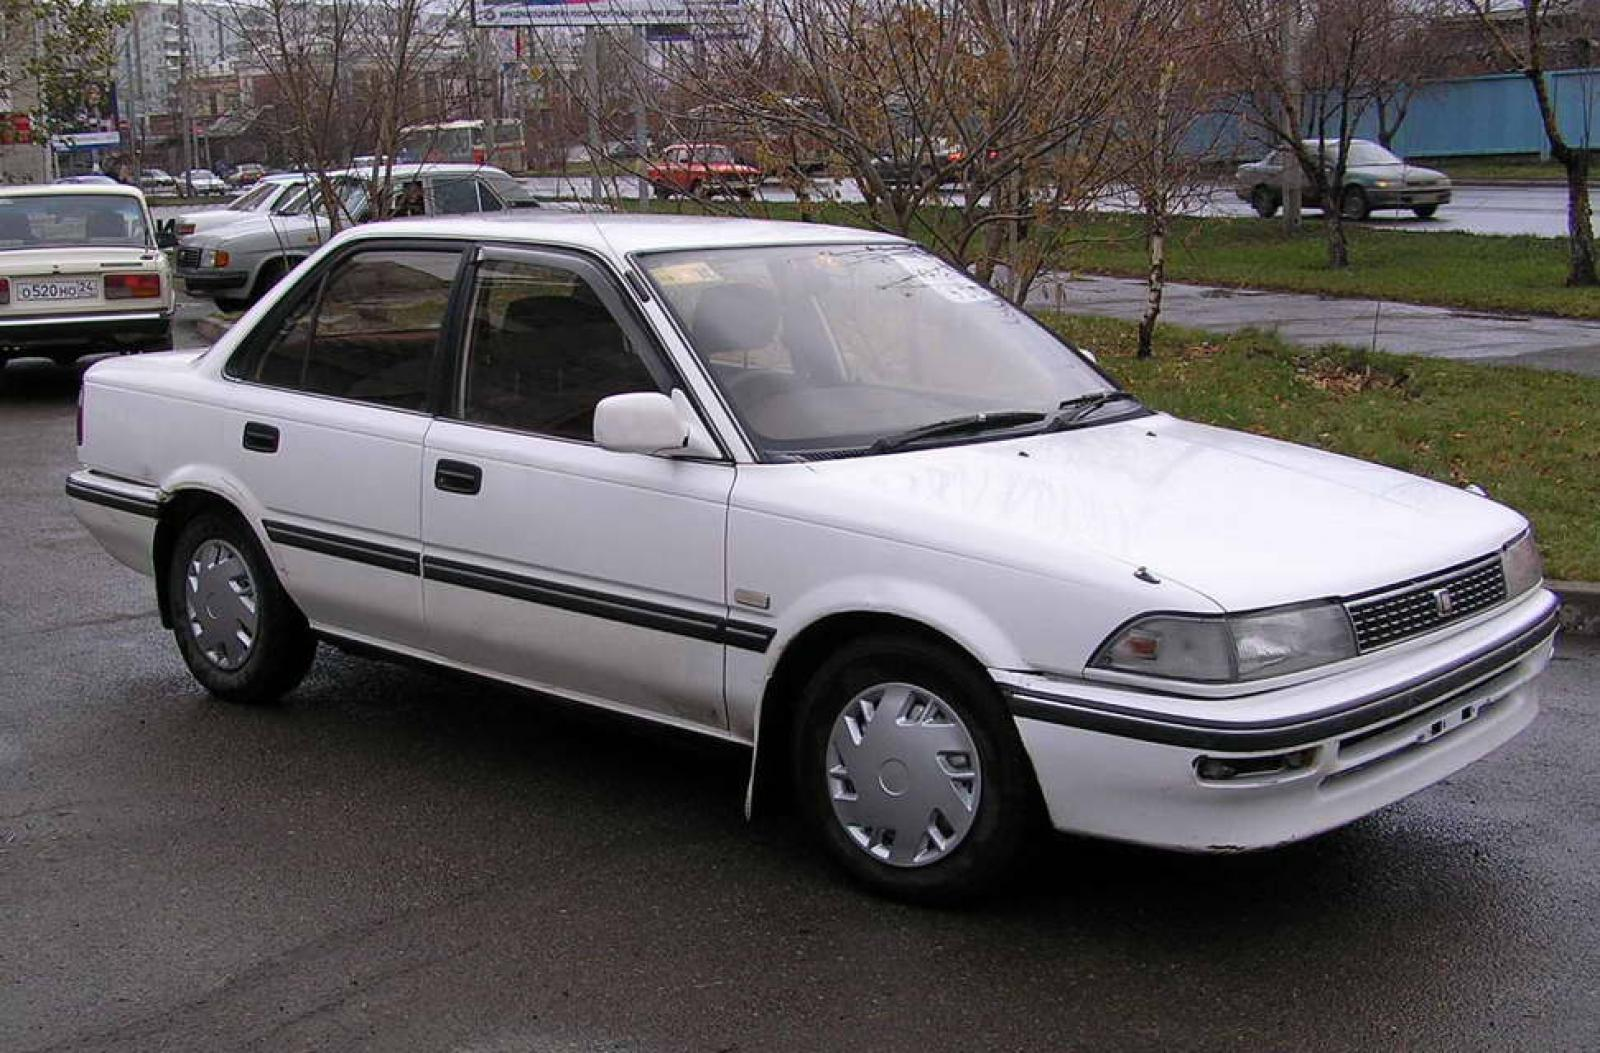 800 1024 1280 1600 origin 1991 Toyota Corolla ...